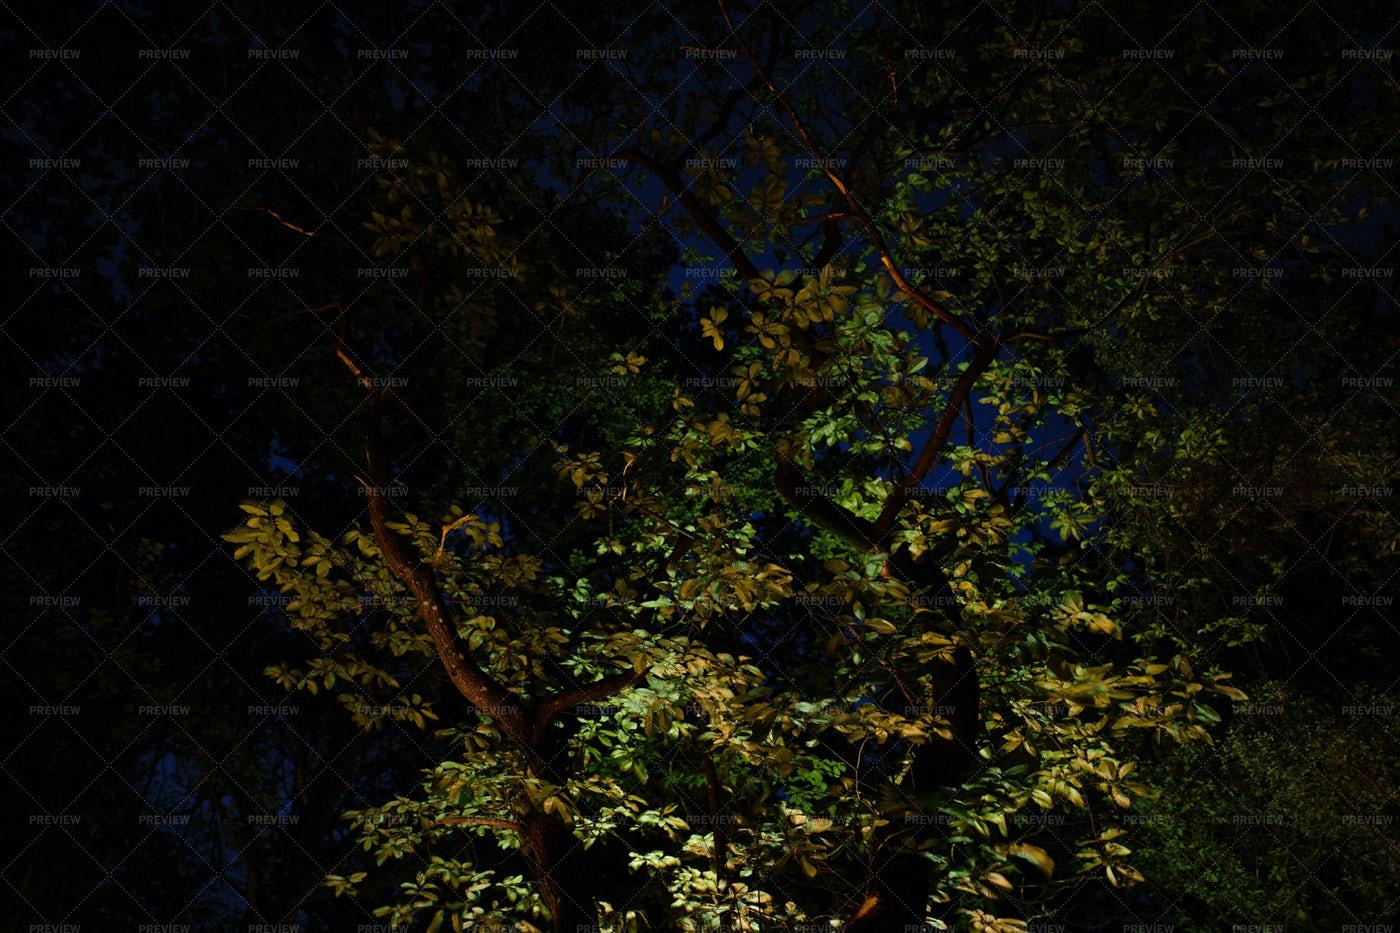 An Illuminated Tree: Stock Photos